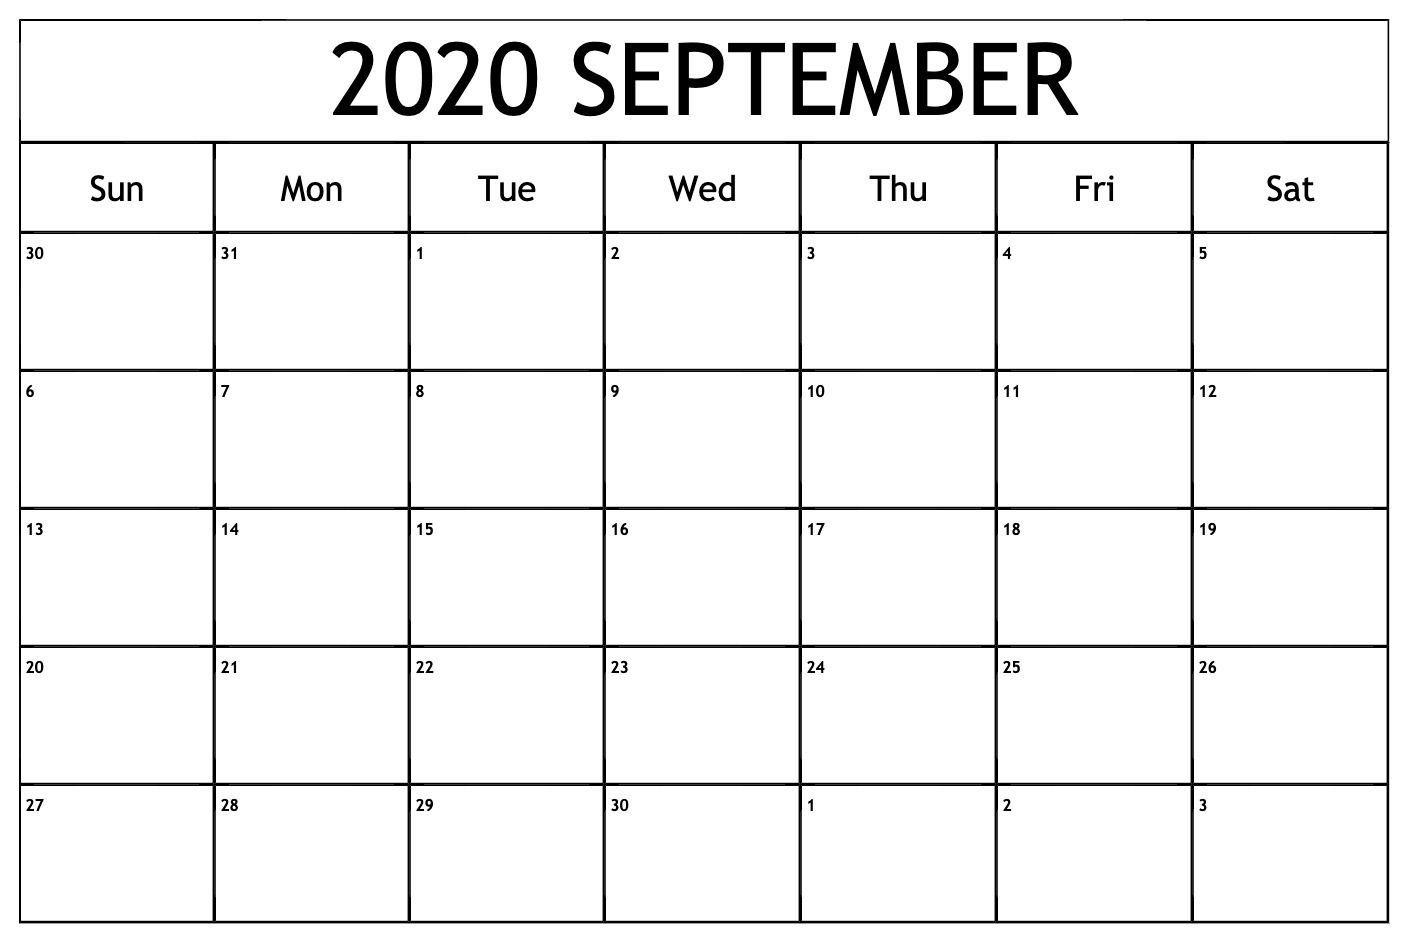 Free Download September 2020 Calendar Wallpapers Top